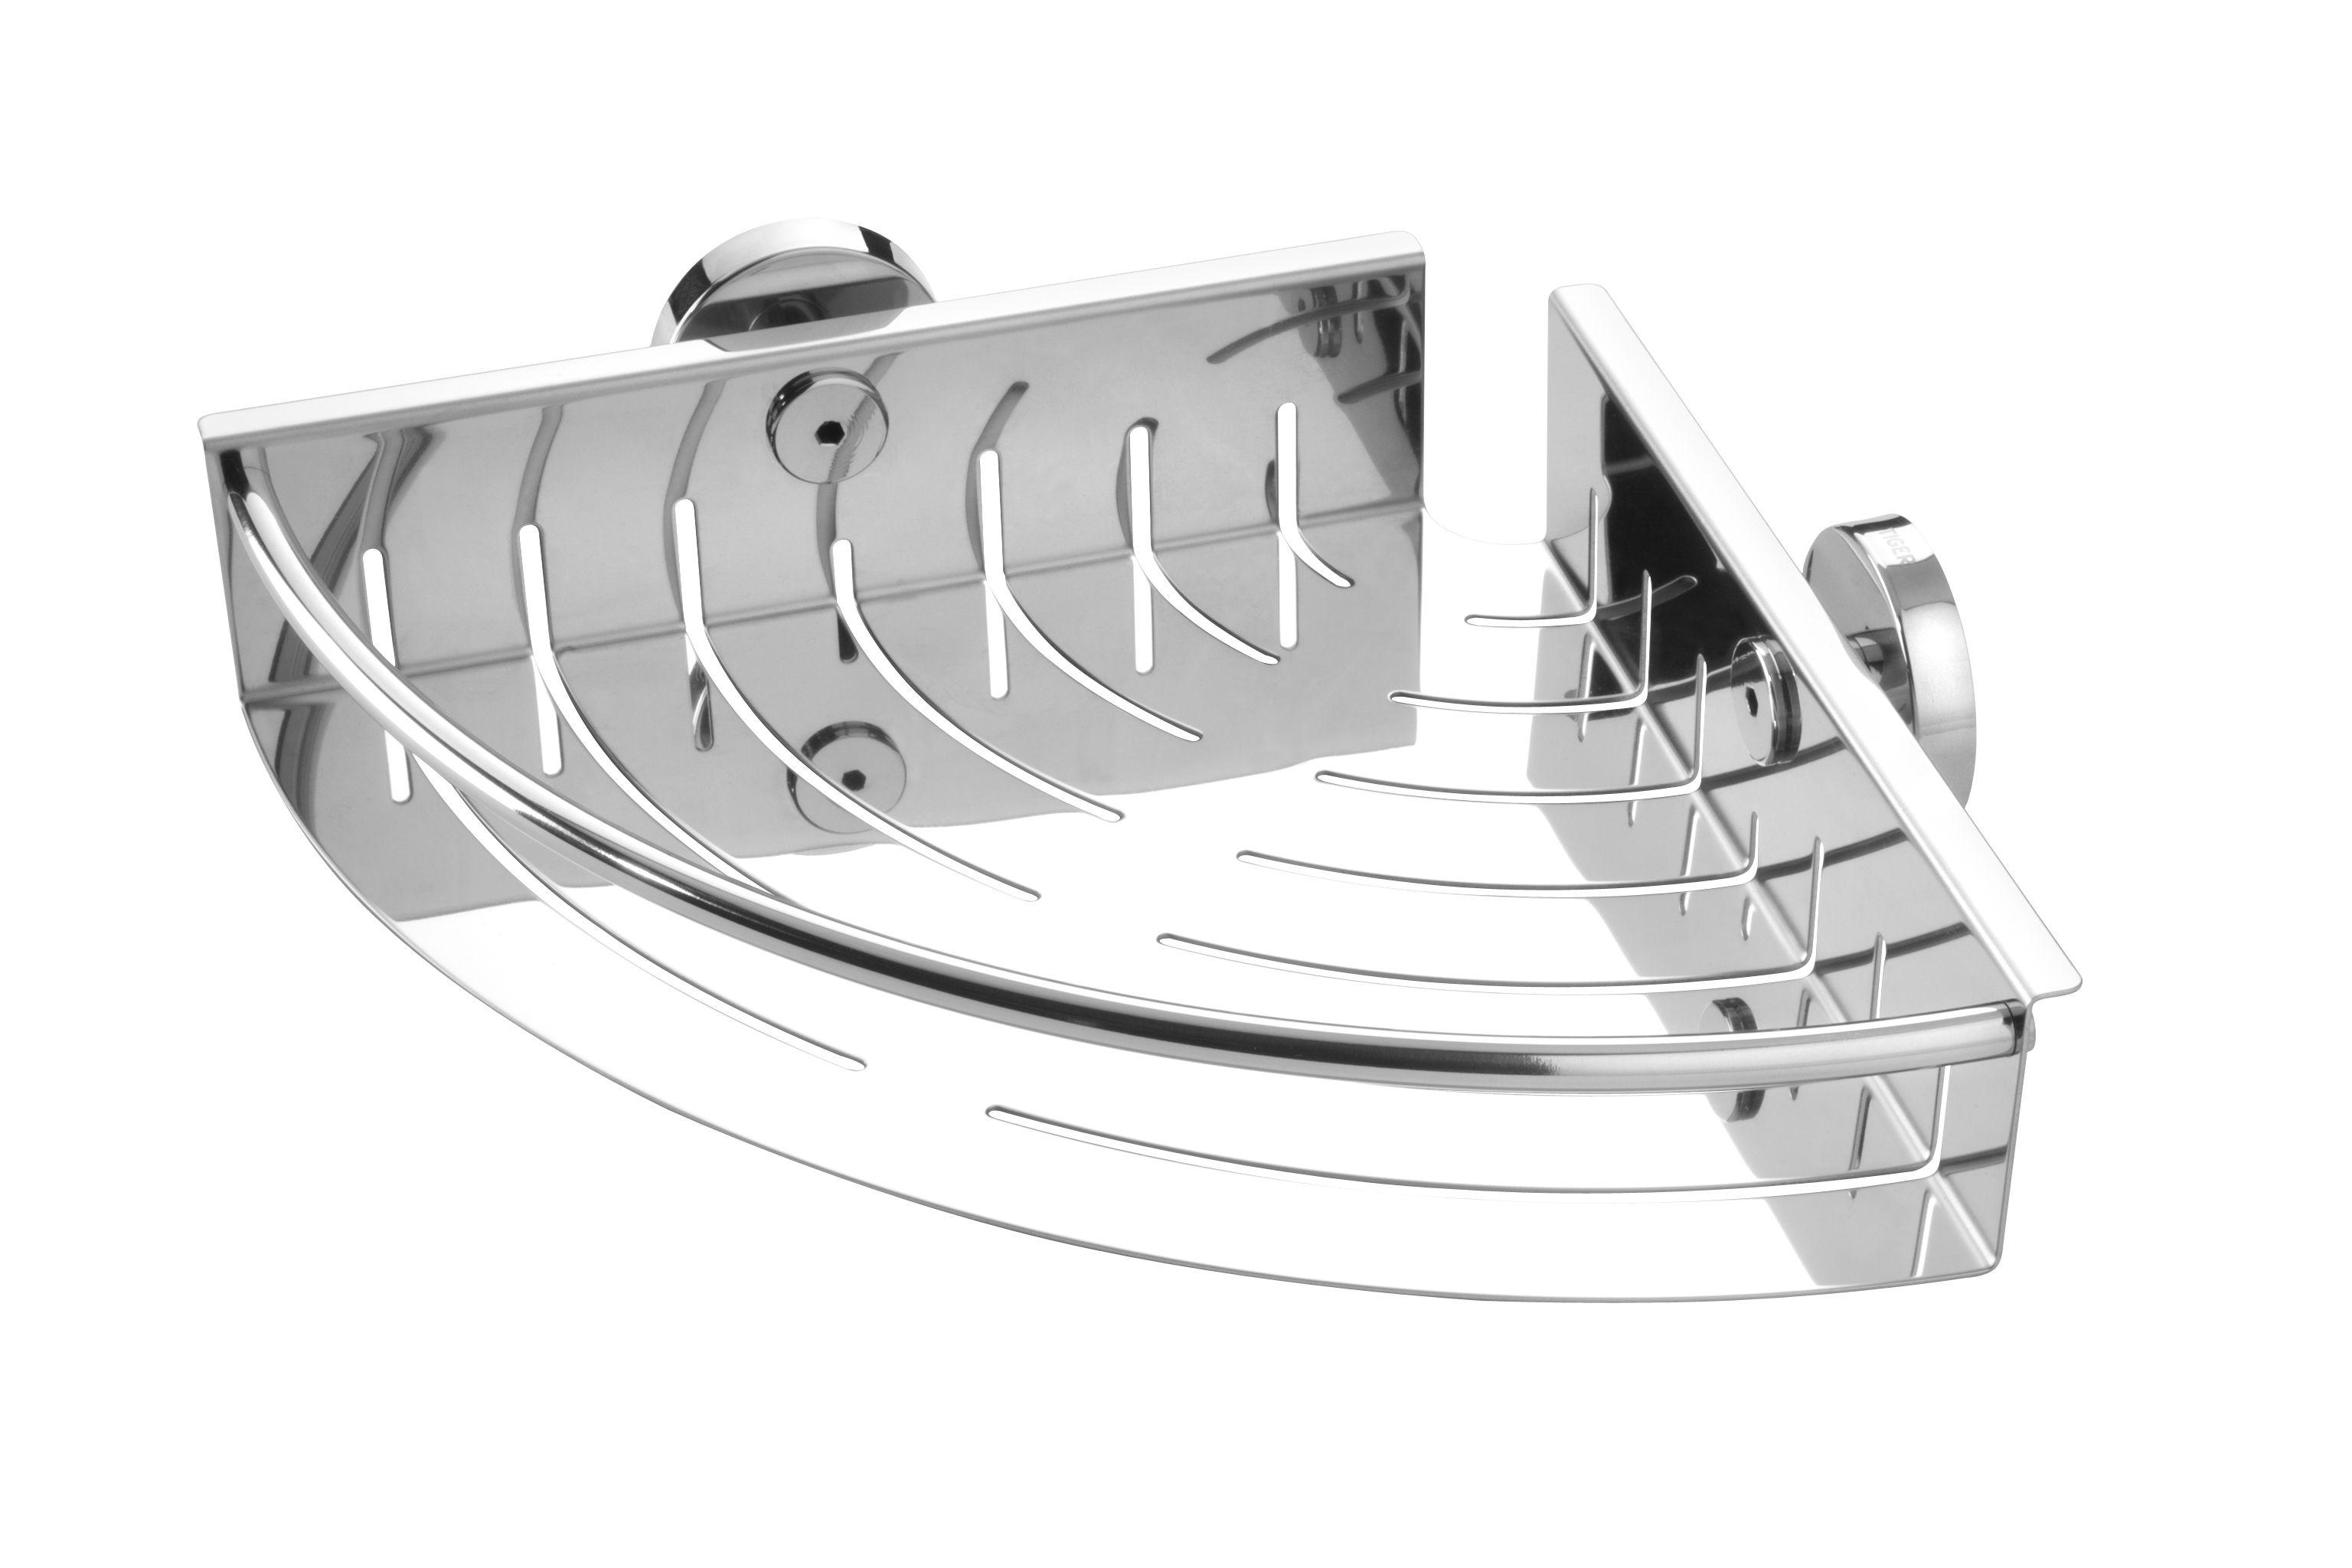 Badkamer Accessoires Rvs : Badkameraccessoires blokker edenberg b fluitketel rvs blokker